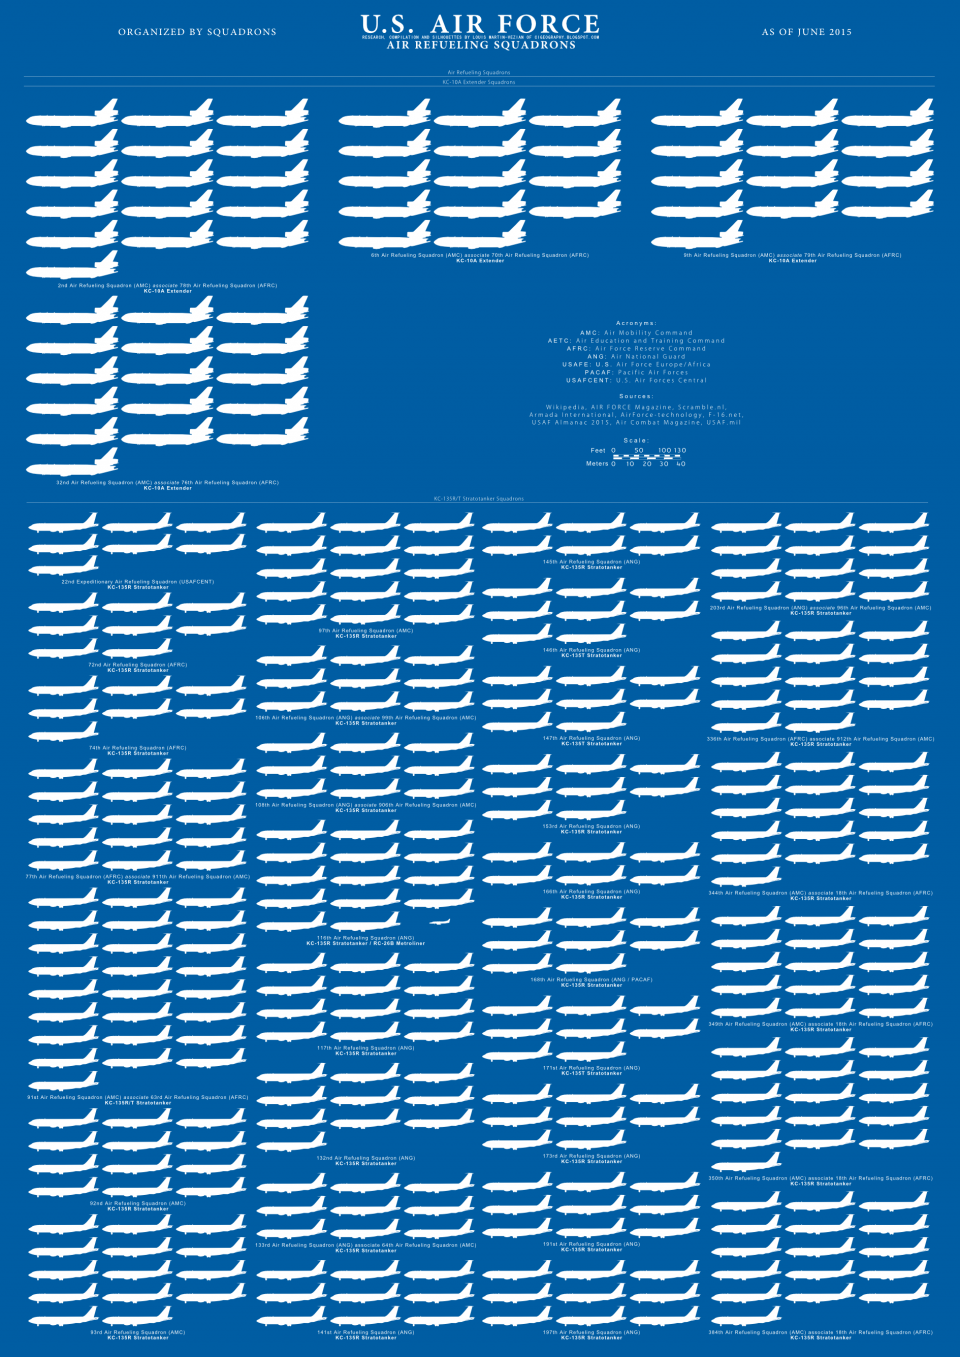 USAFs aerial refueling fleet